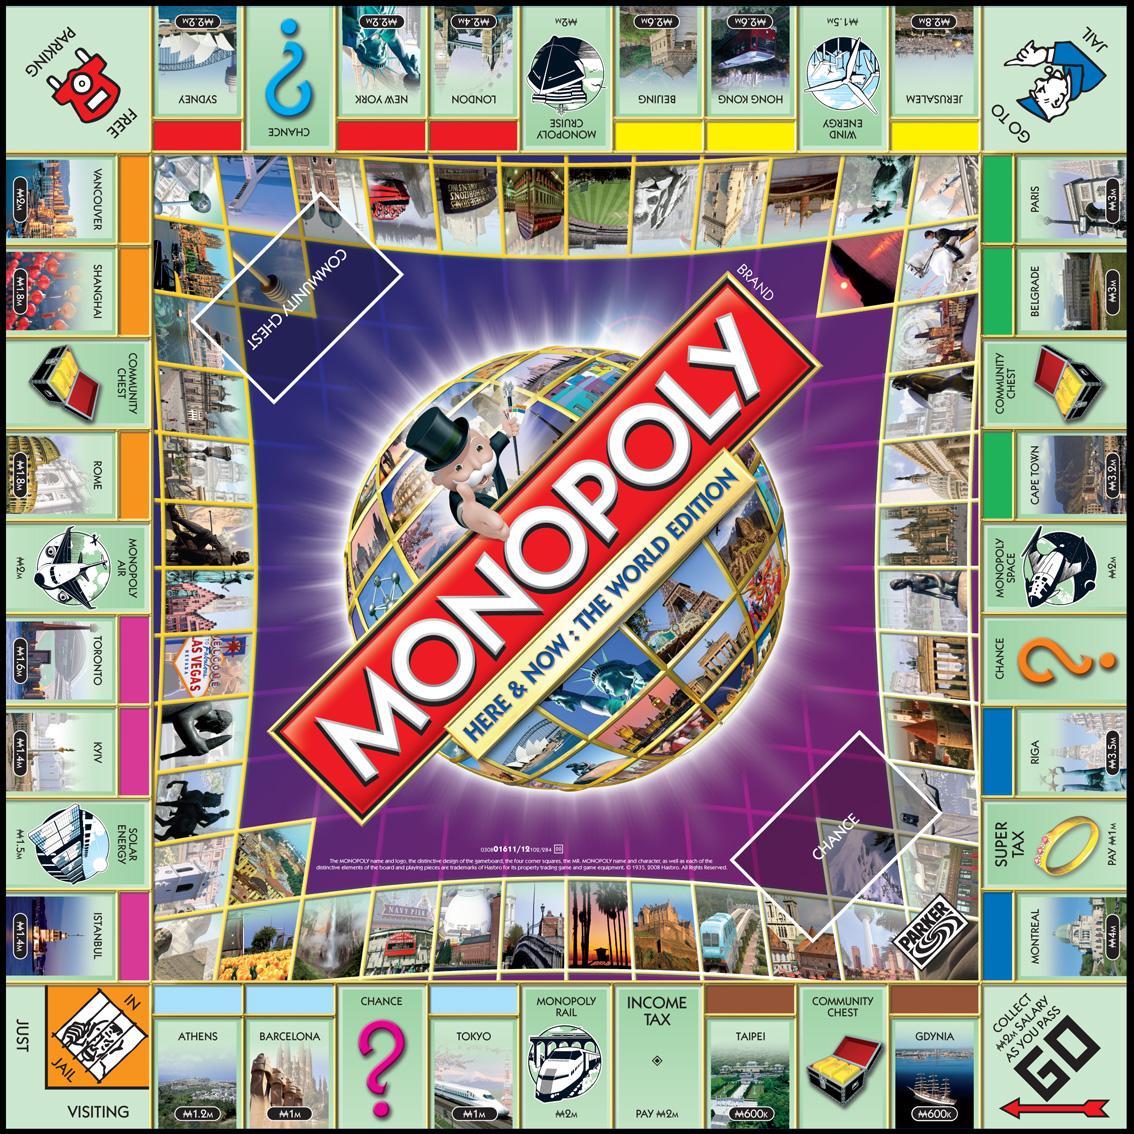 Help put toronto on the (monopoly) map.